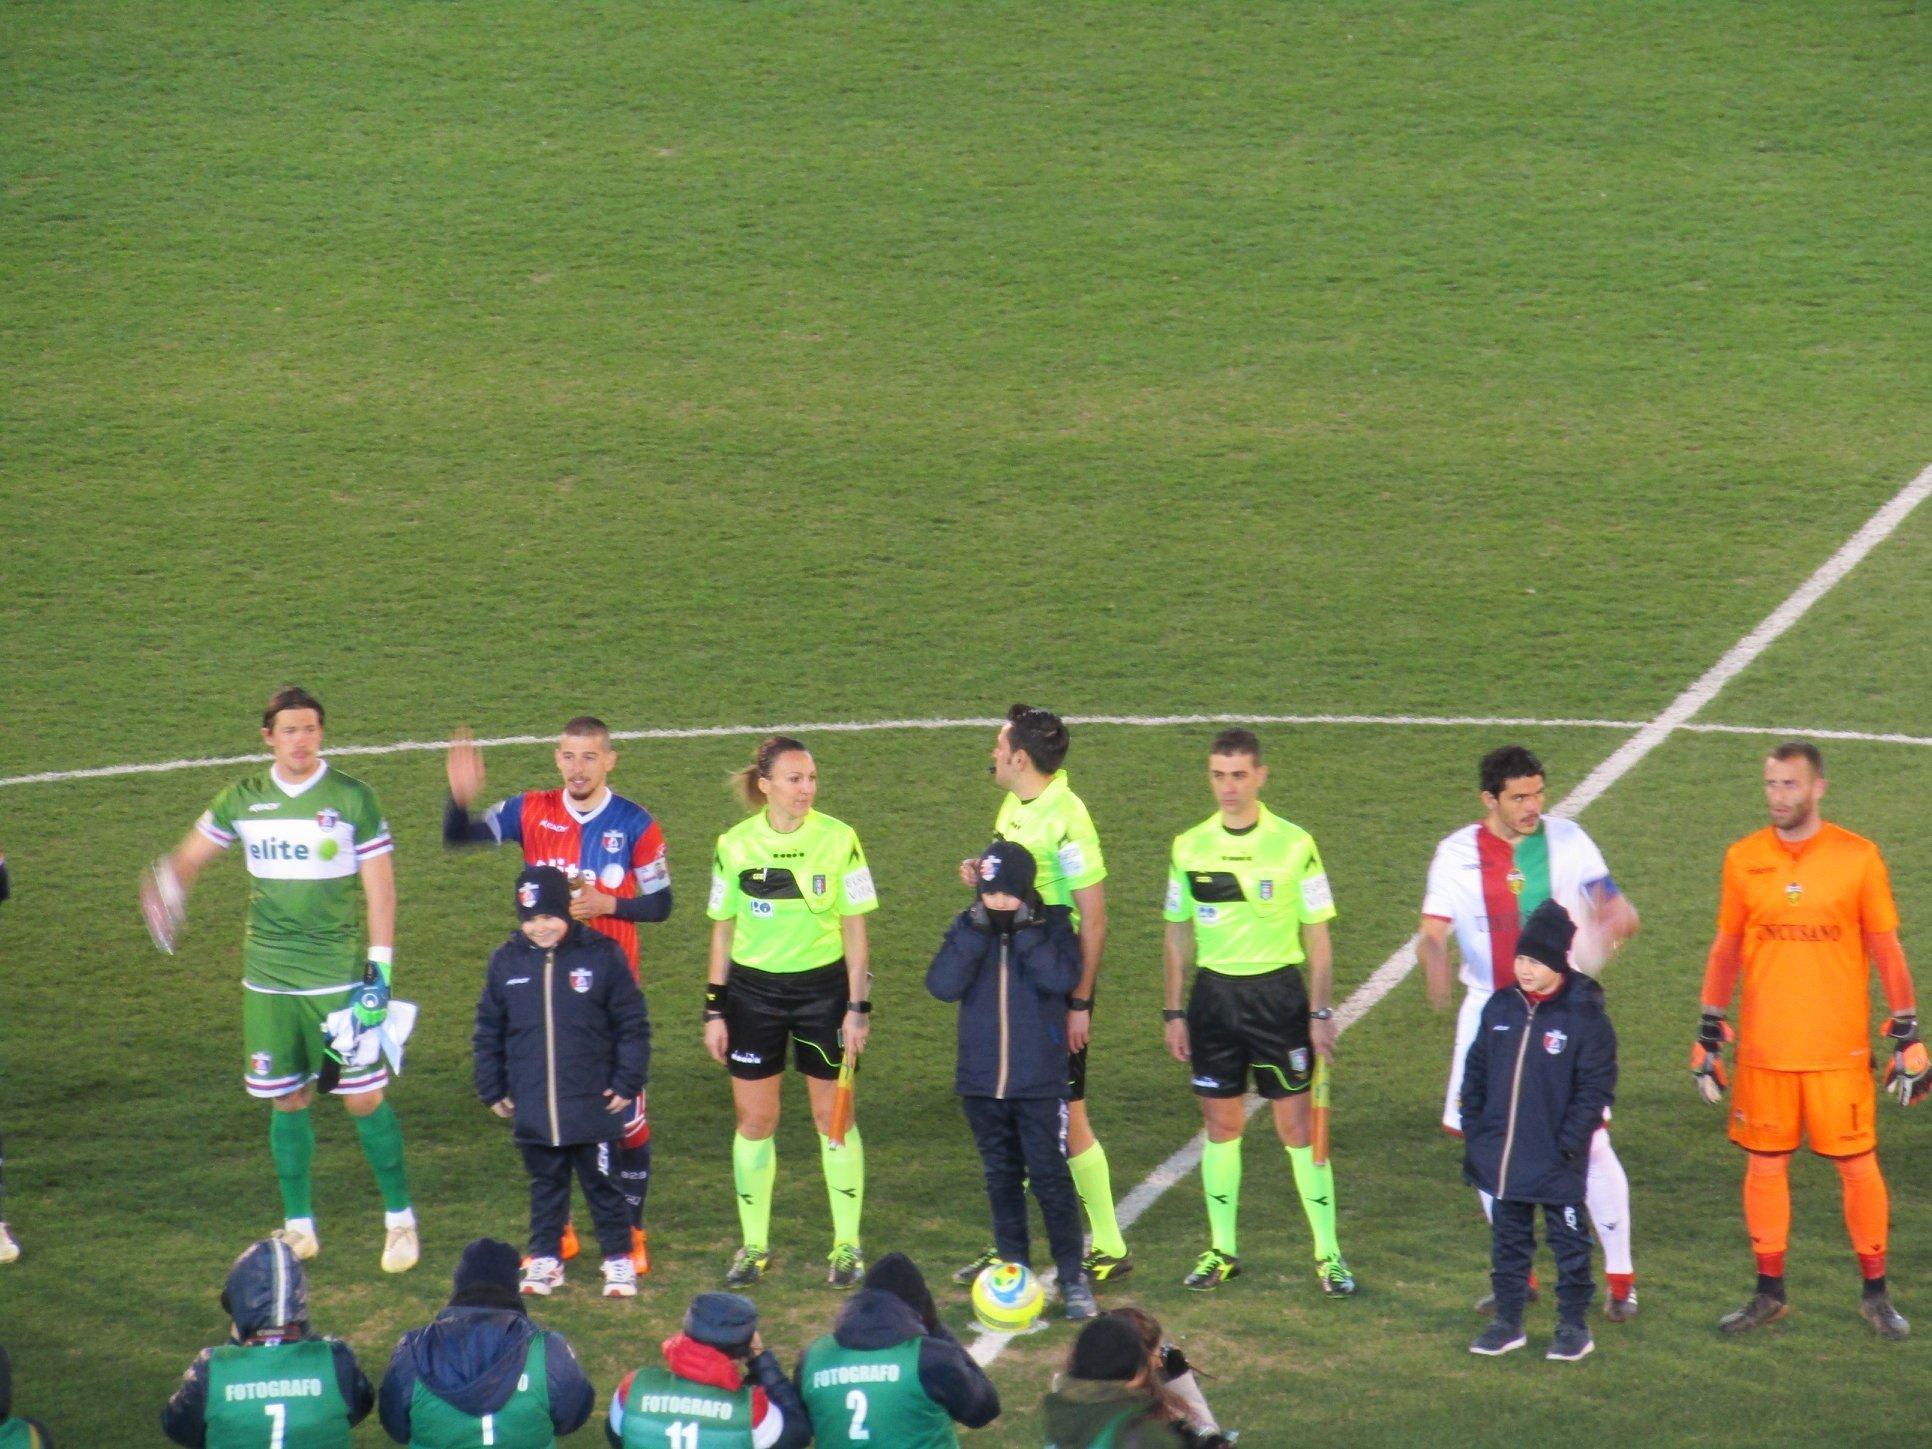 Lega Pro Ternana-Sambenedettese, la diretta del match